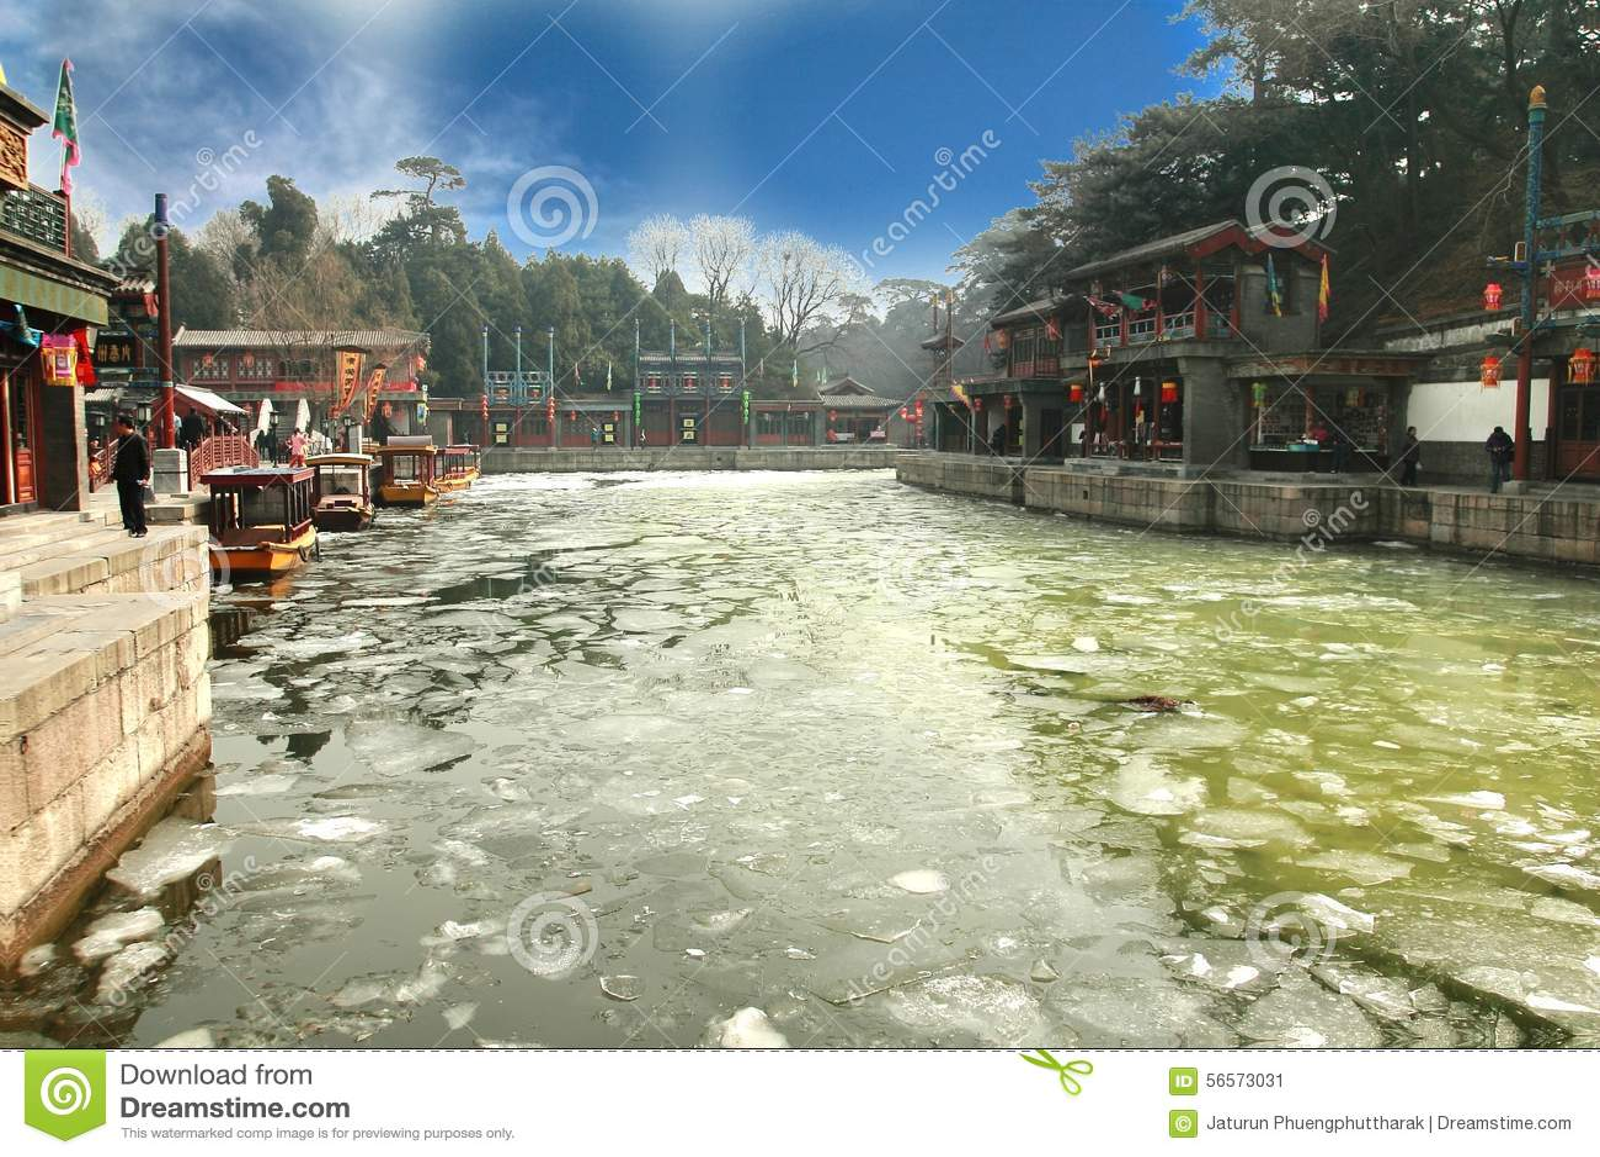 Download Το θερινό παλάτι στο Πεκίνο, Κίνα Εκδοτική Εικόνες - εικόνα από μεγαλοπρεπής, ουρανός: 56573031